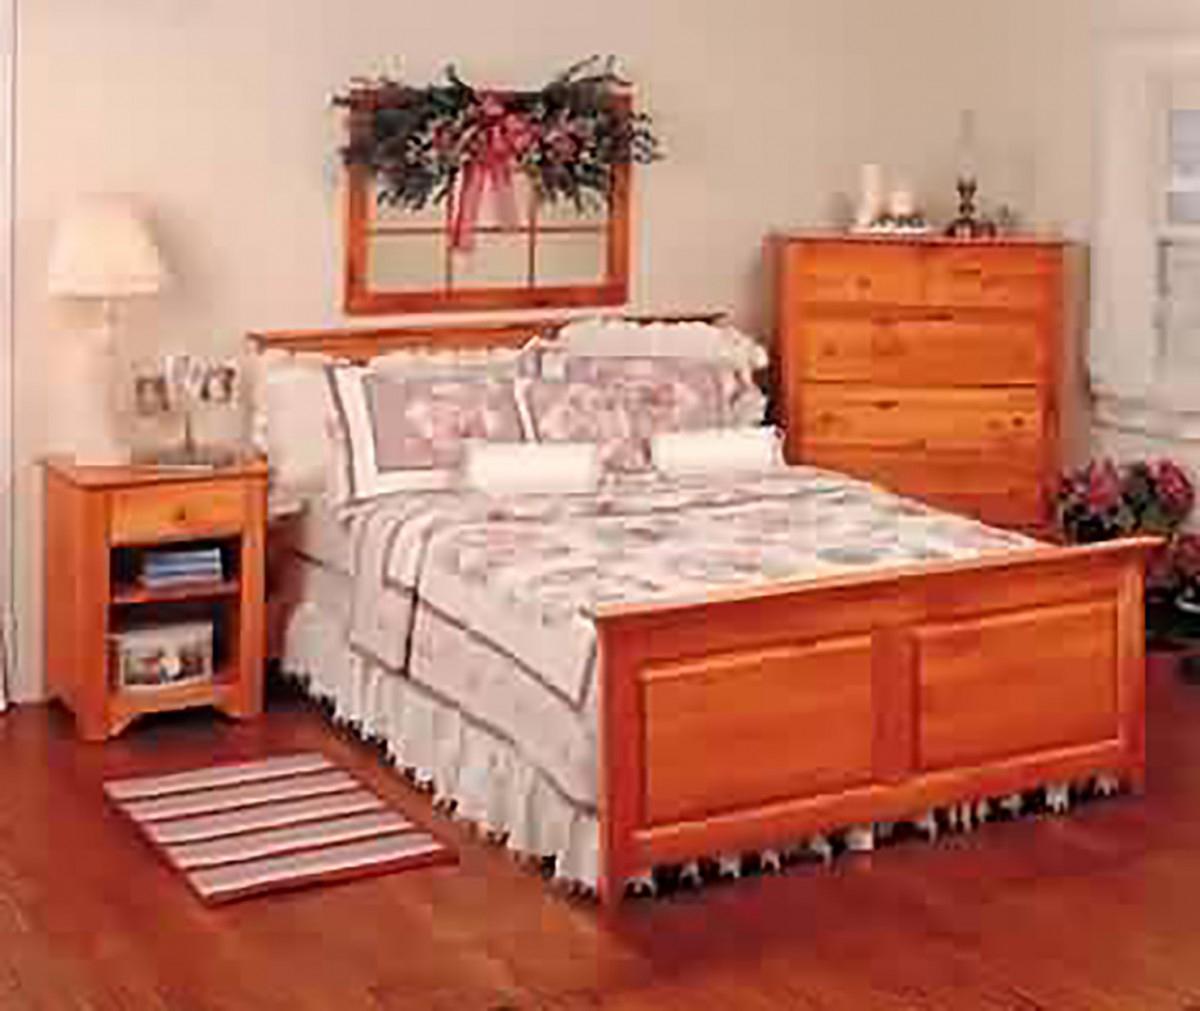 Footboard Unfinished Pine Twin Footboard 45.5 W Wood Footboards Footboard Wood Footboard Bed Footboard